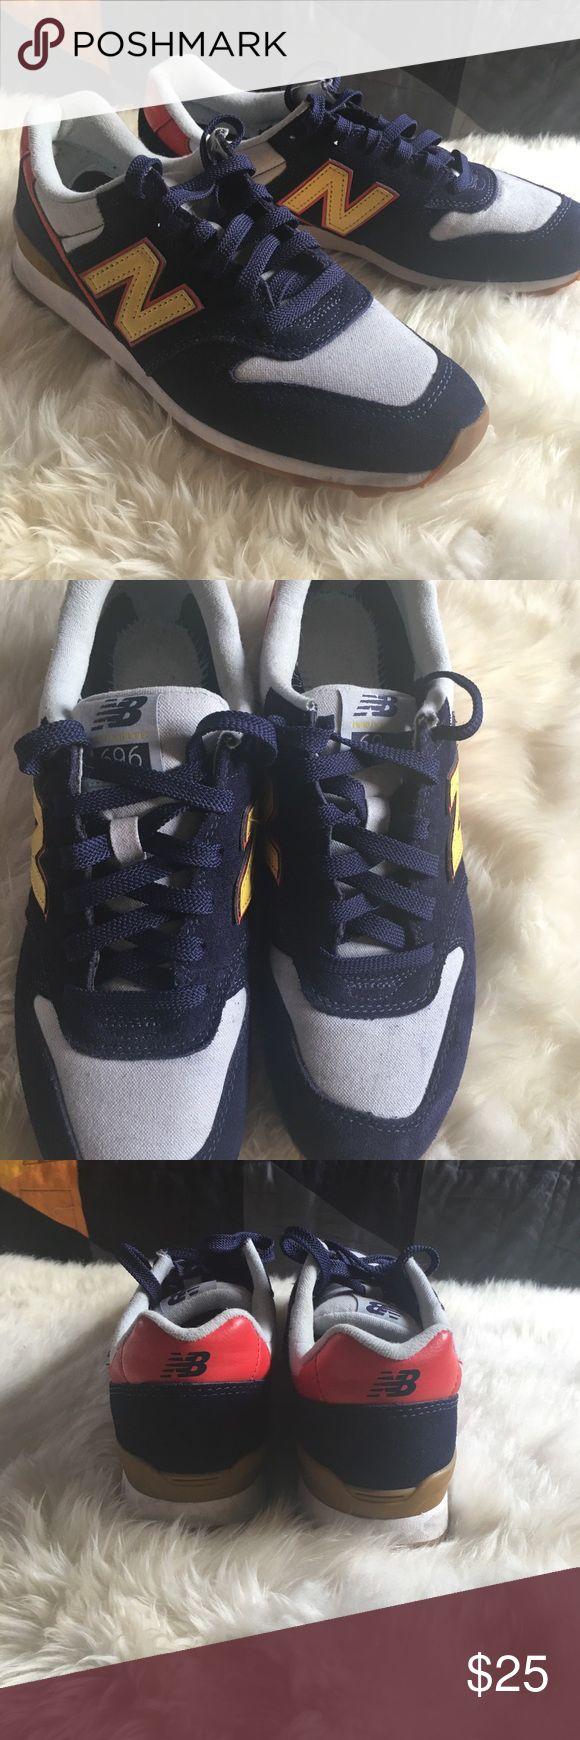 new balance inserts. funky new balance sneakers inserts